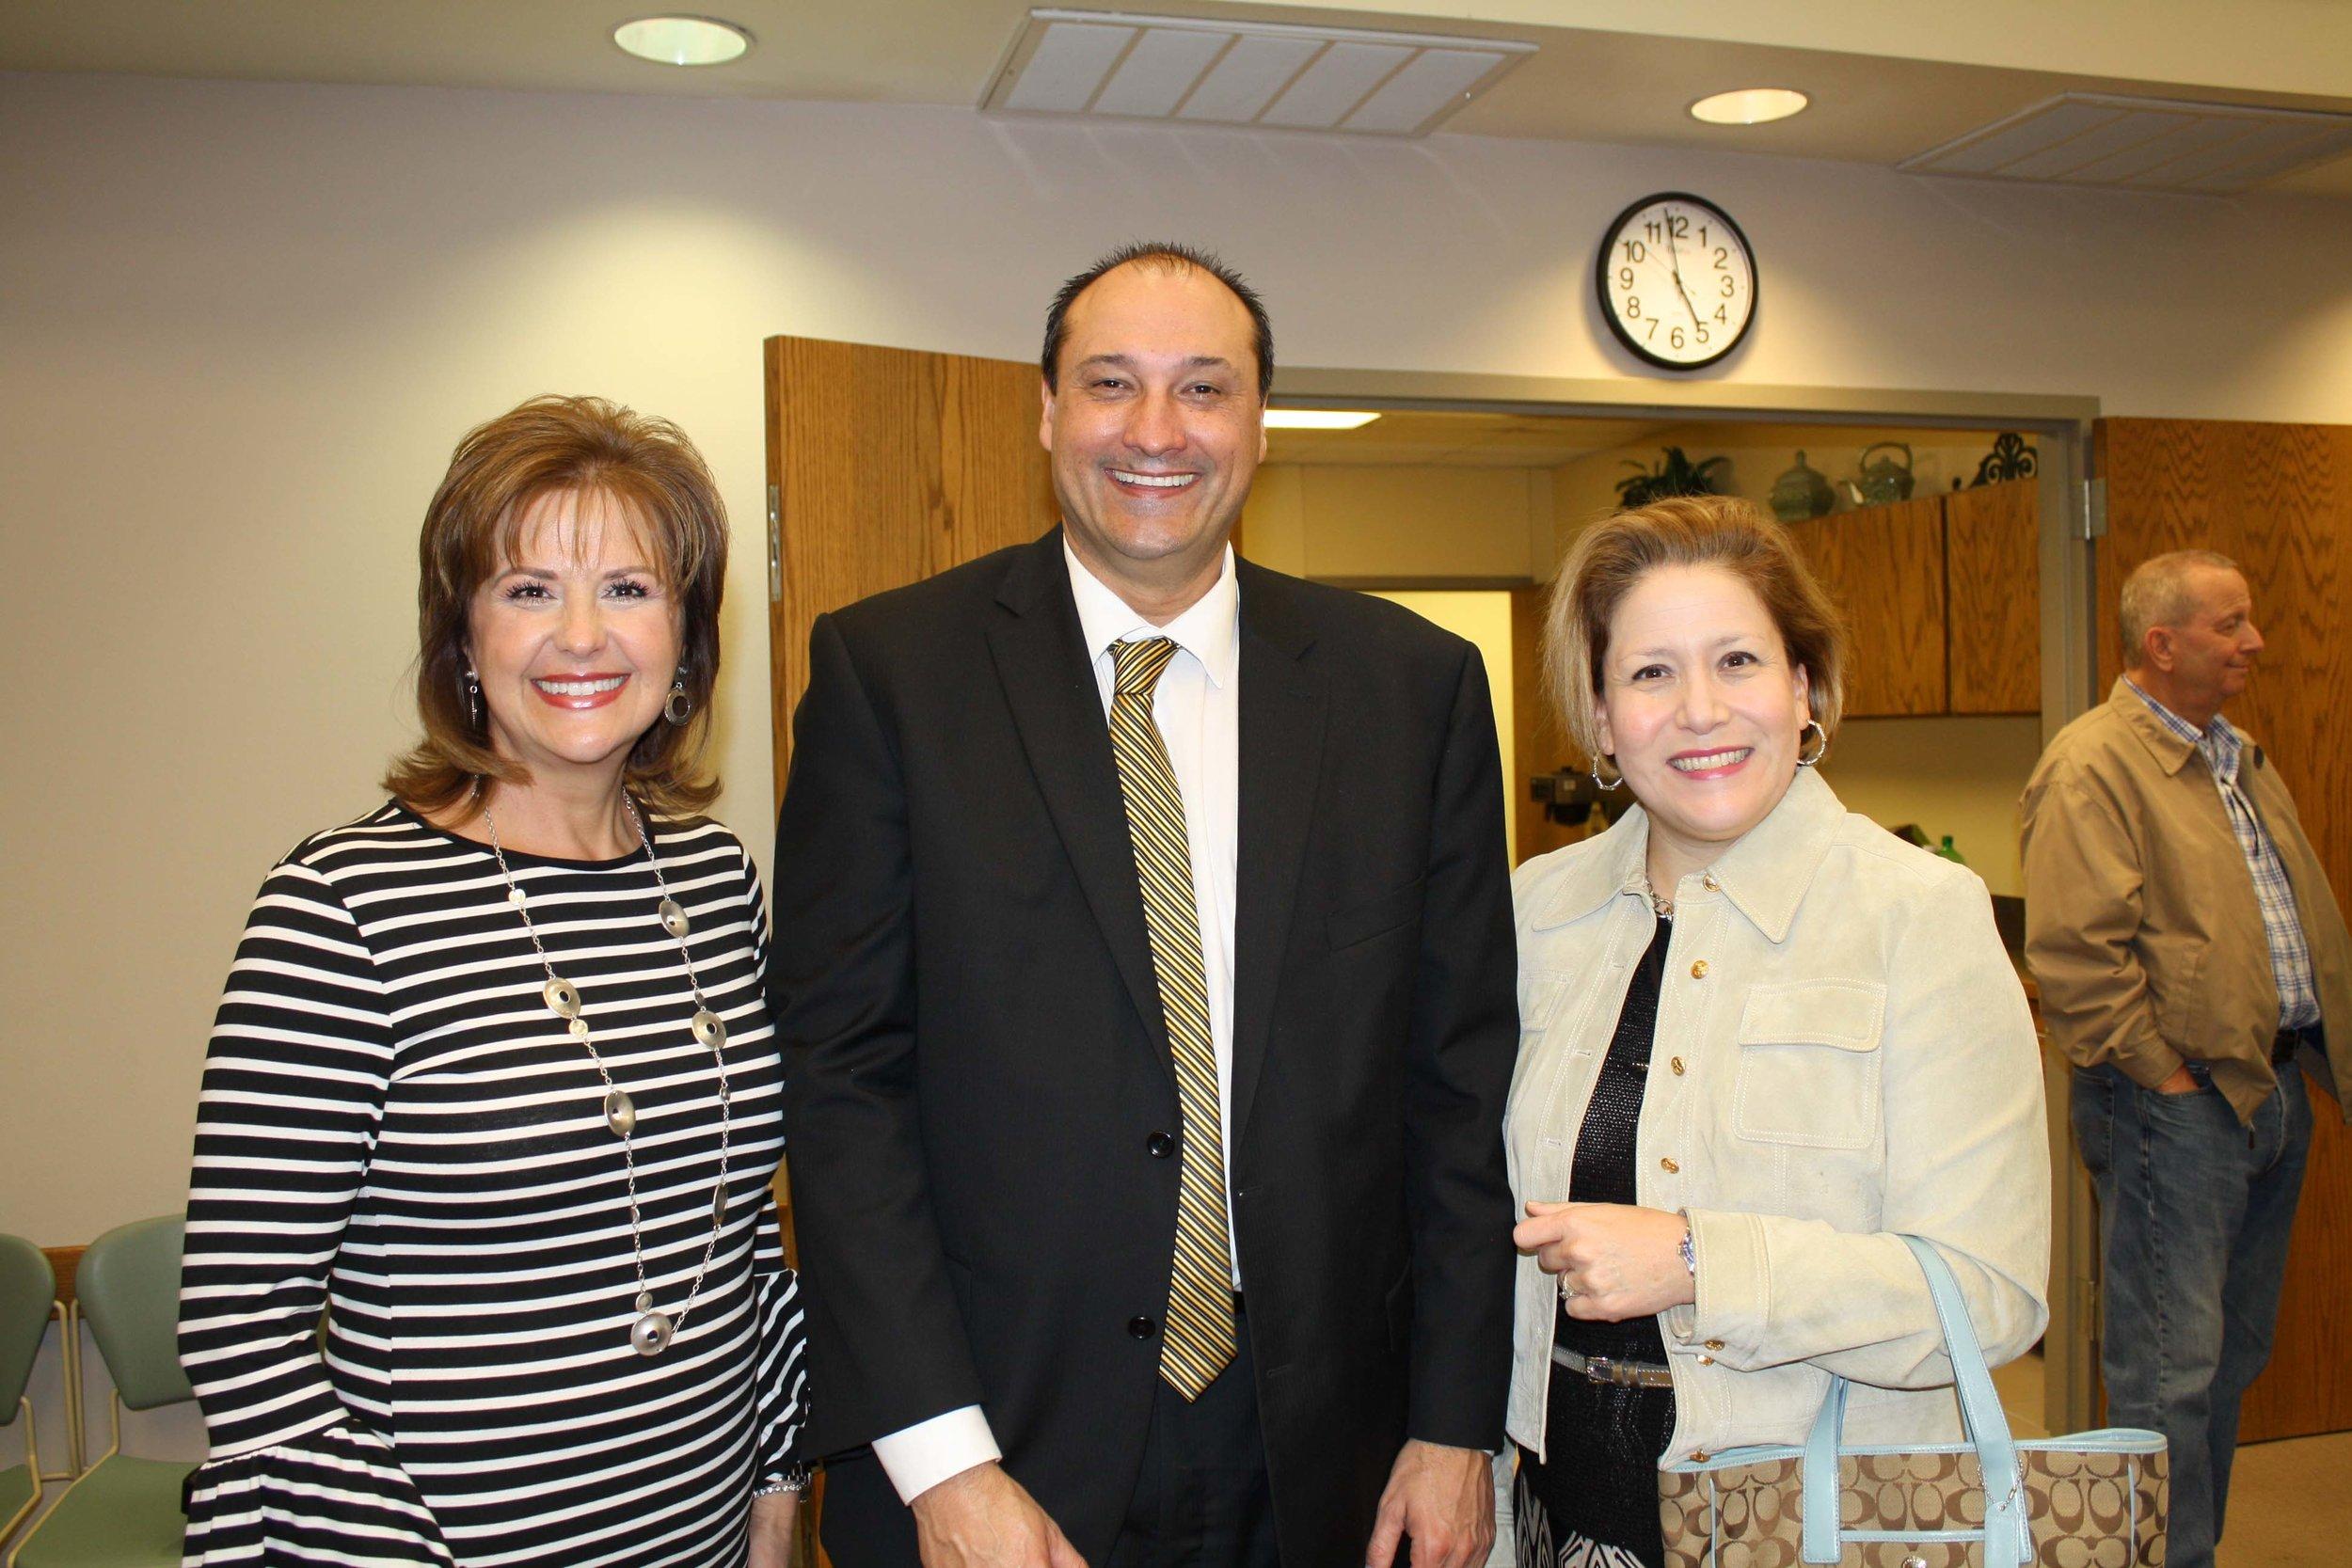 Patricia Beth, Dr. Jason Smith and Lindsey McMillan